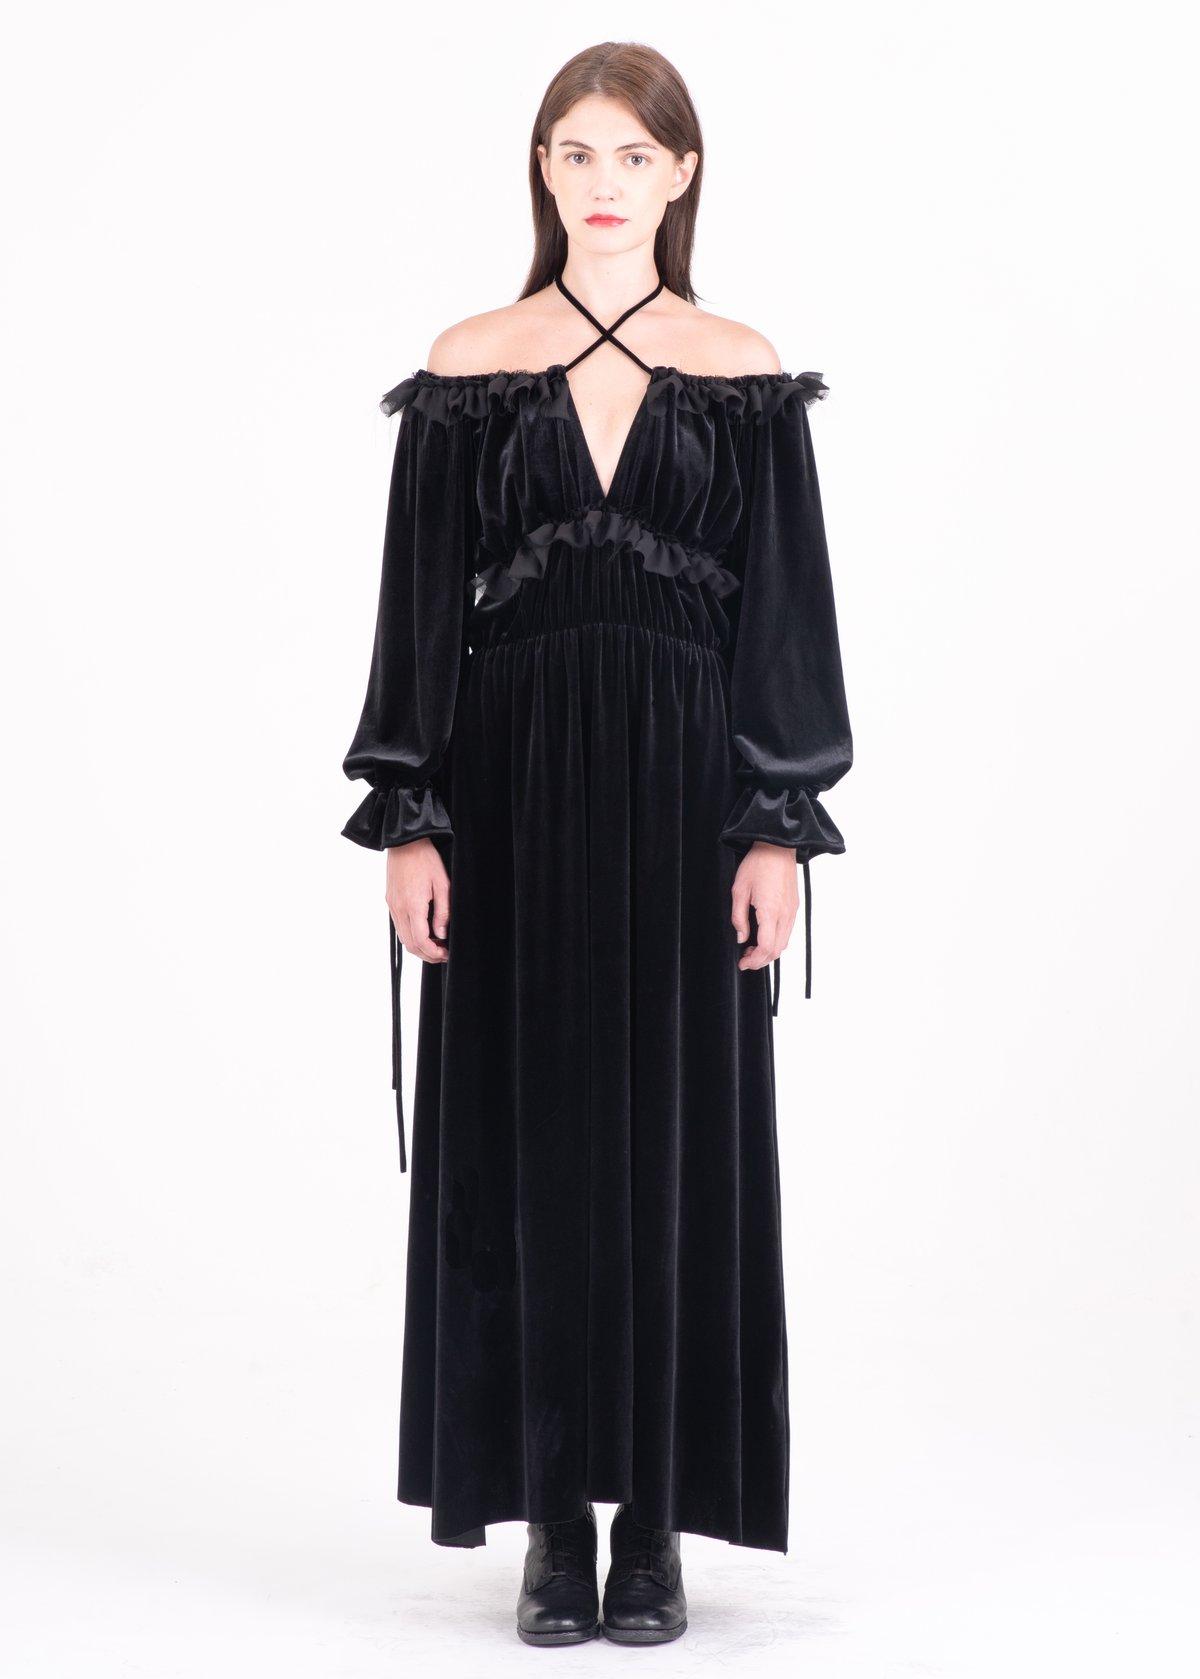 Image of Mona Lace Up Long Dress in Black Velvet